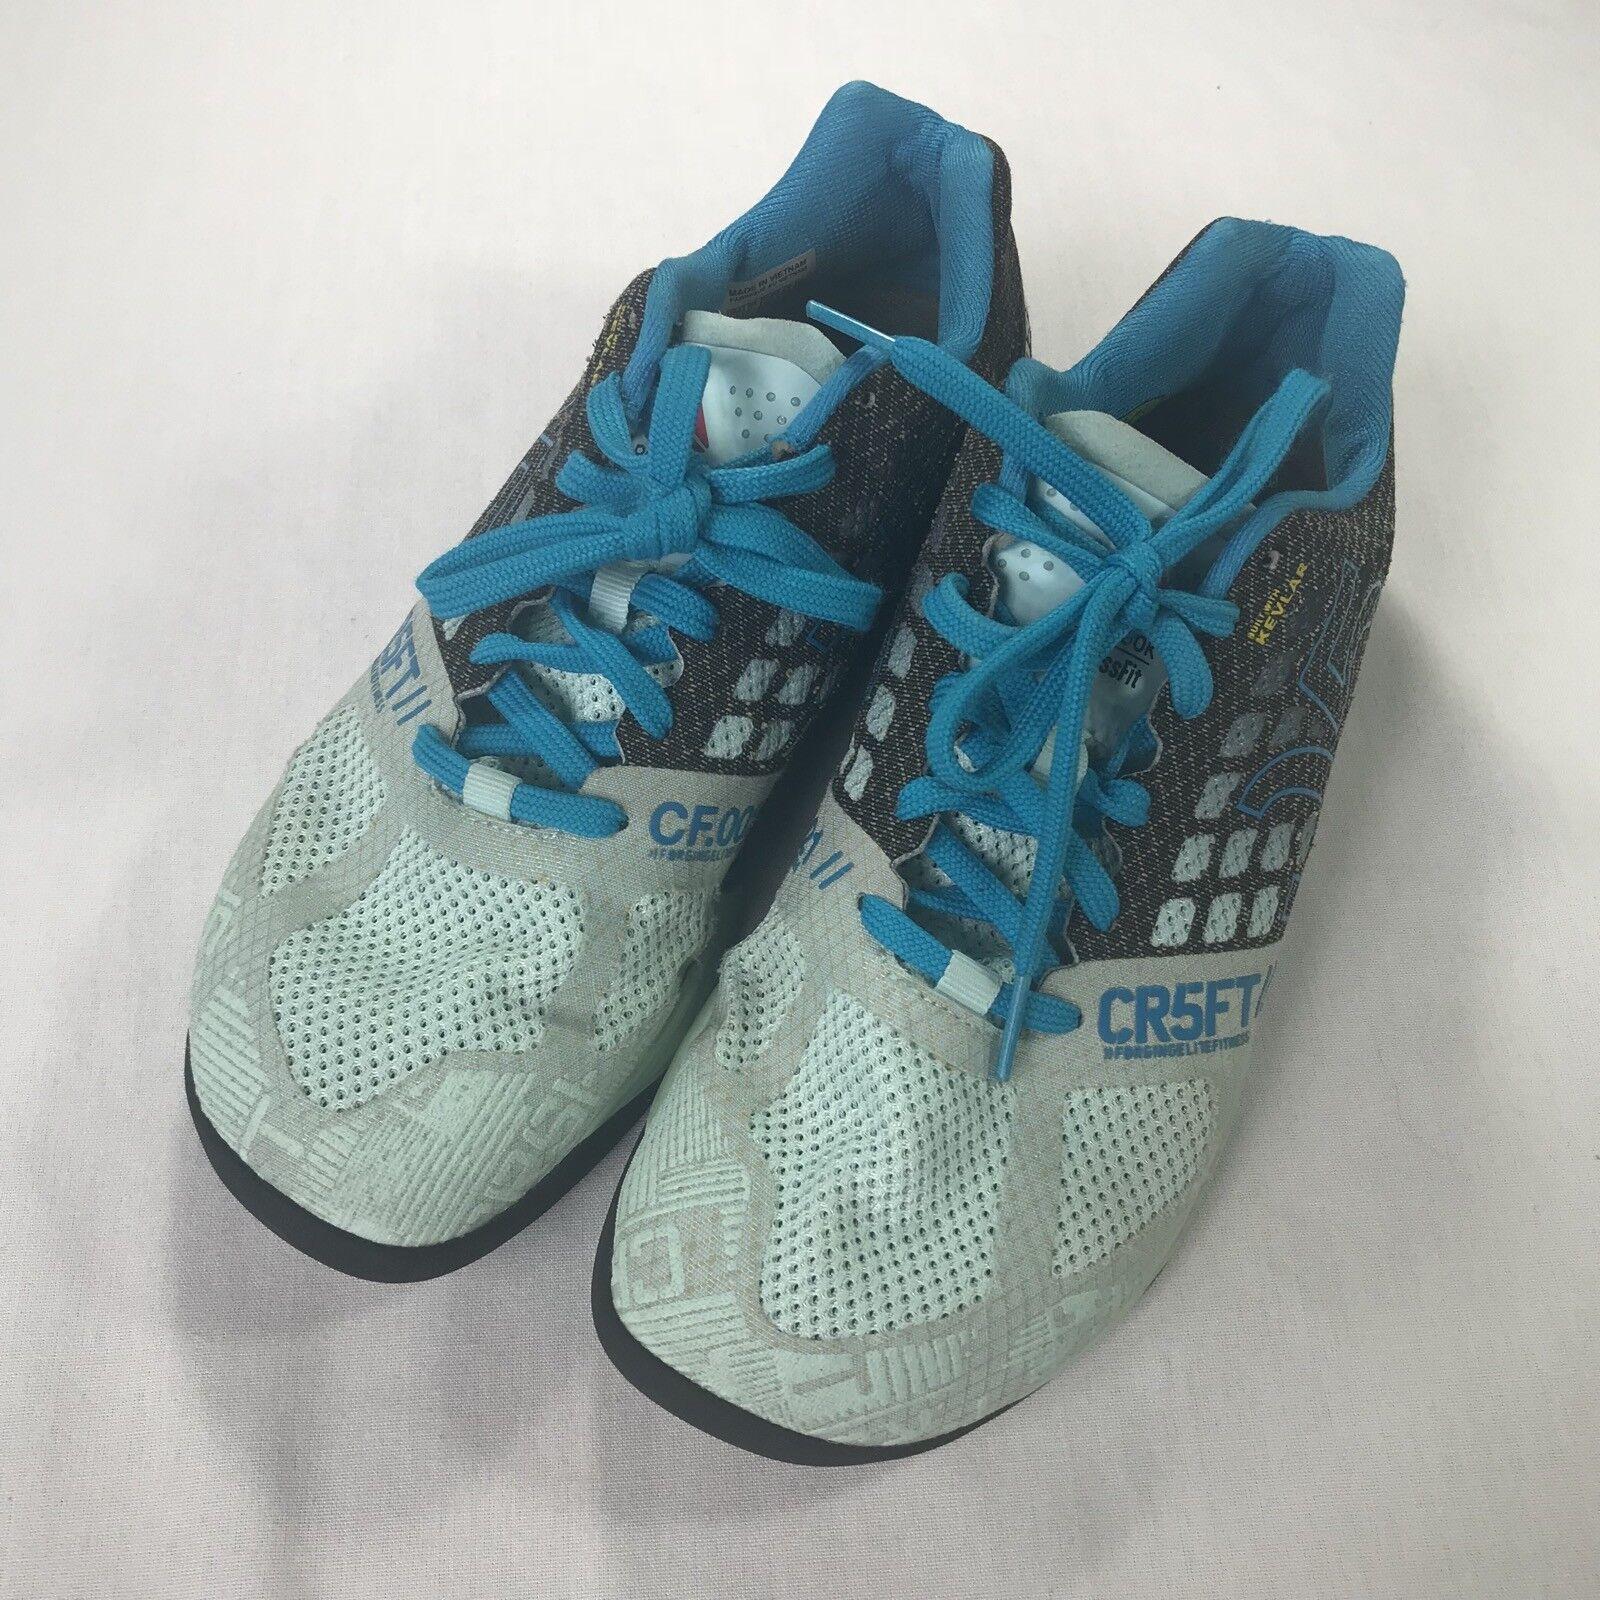 Reebok CrossFit Nano Size 5.0 Training Shoes Womens Size Nano 9.5 Blue e75931